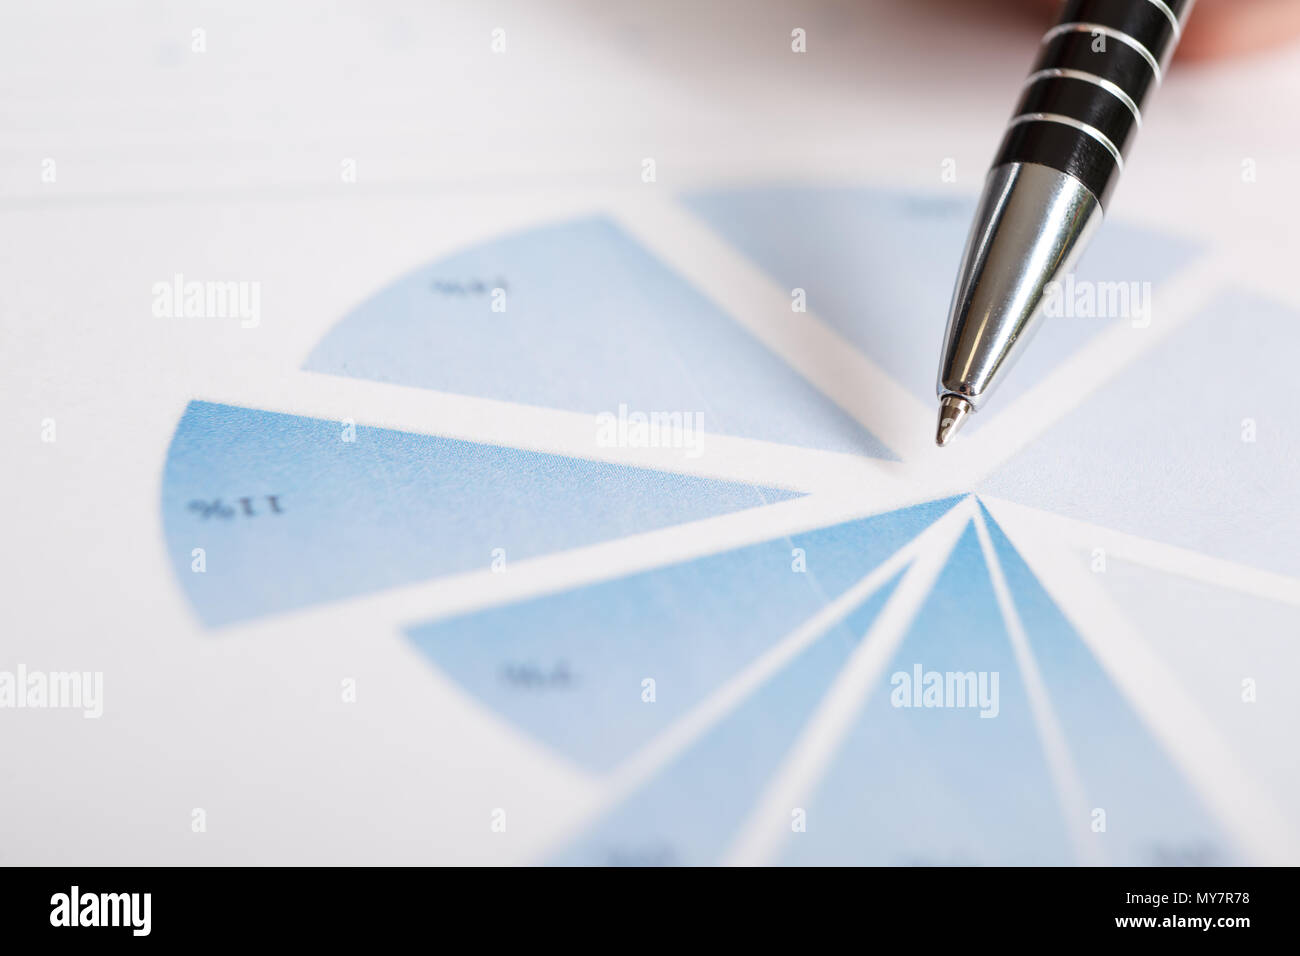 Pen on graph. Macro image.Financial data analysis concept - Stock Image